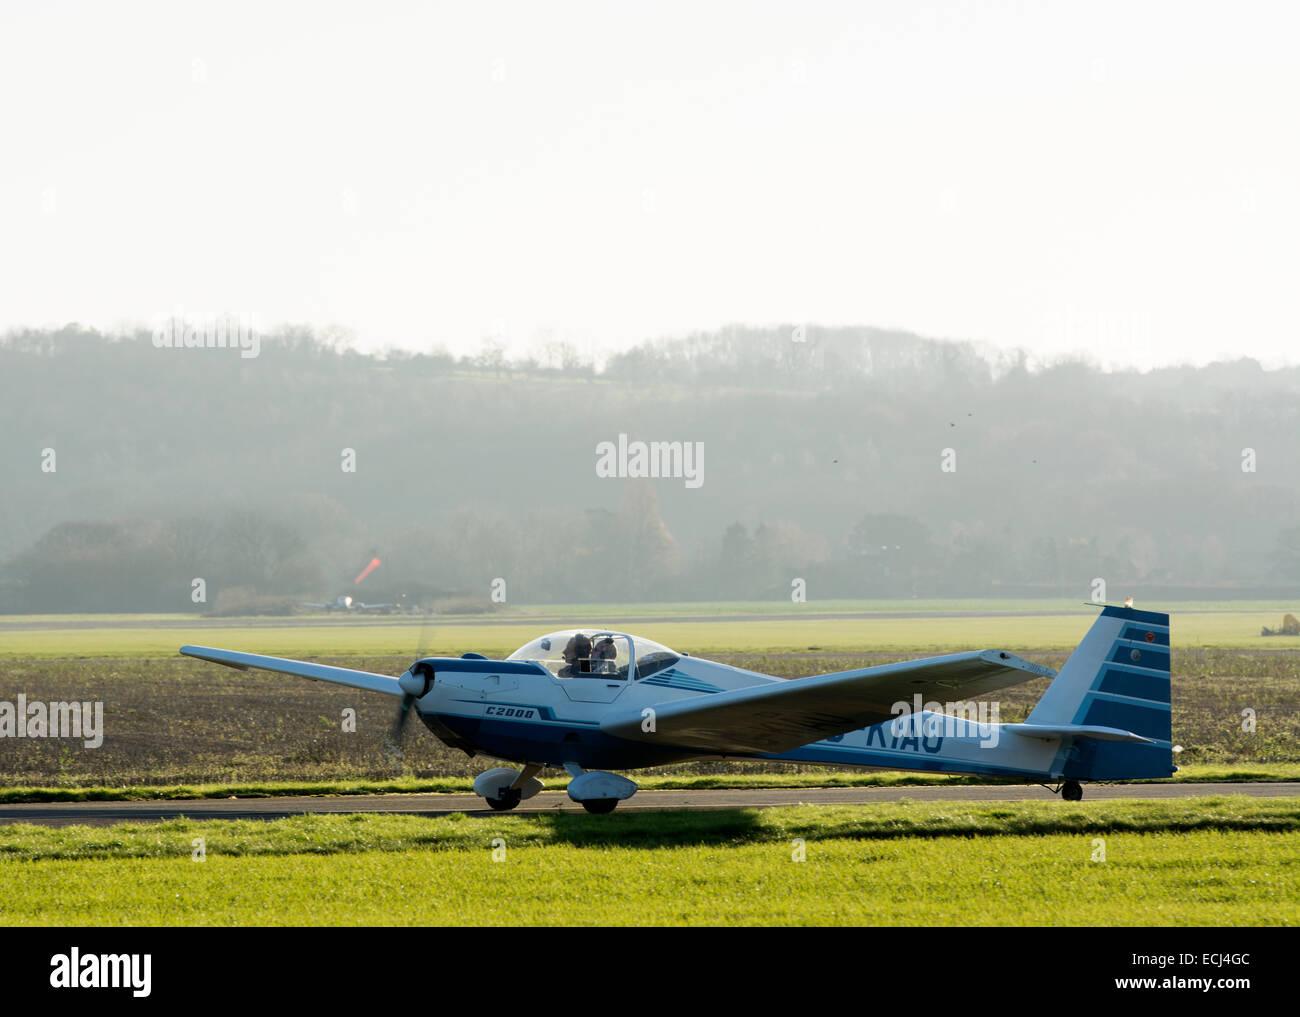 Scheibe SF-25 Falke. G-KIAU - Stock Image